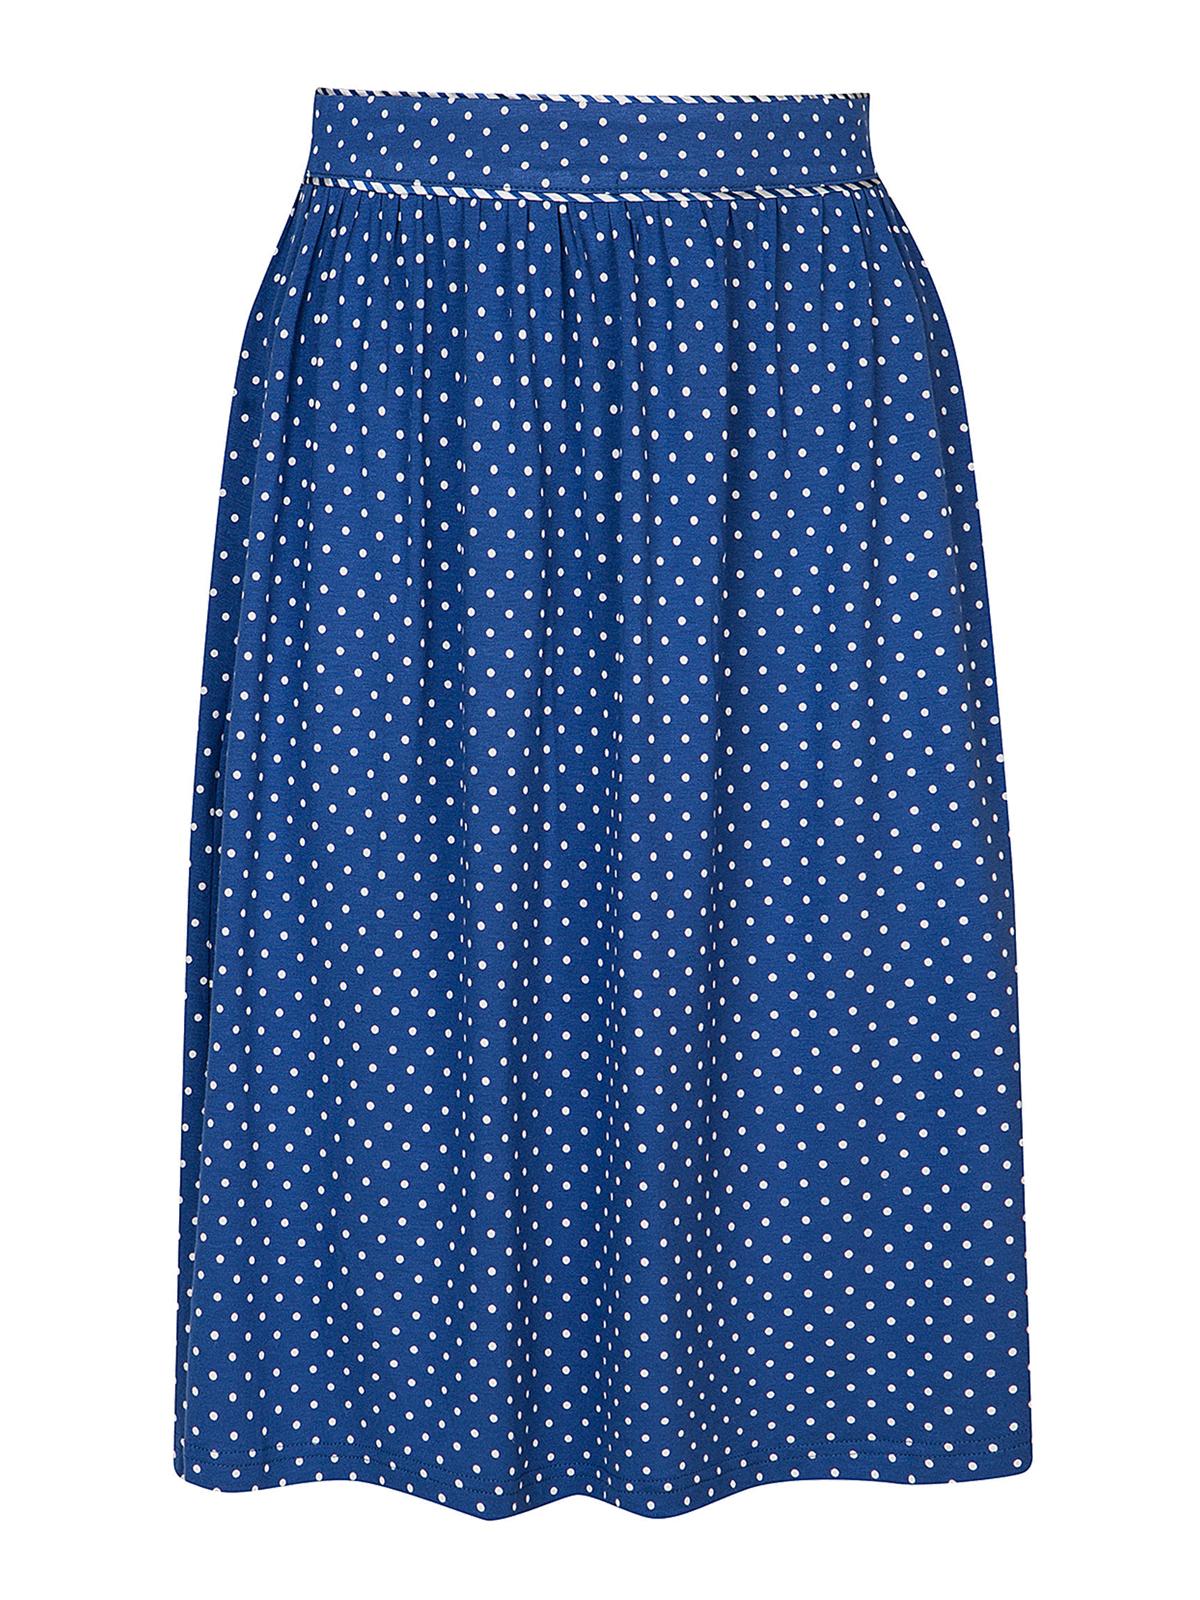 Roecke - Vive Maria Nizza Skirt Blue Allover – Größe S  - Onlineshop NAPO Shop